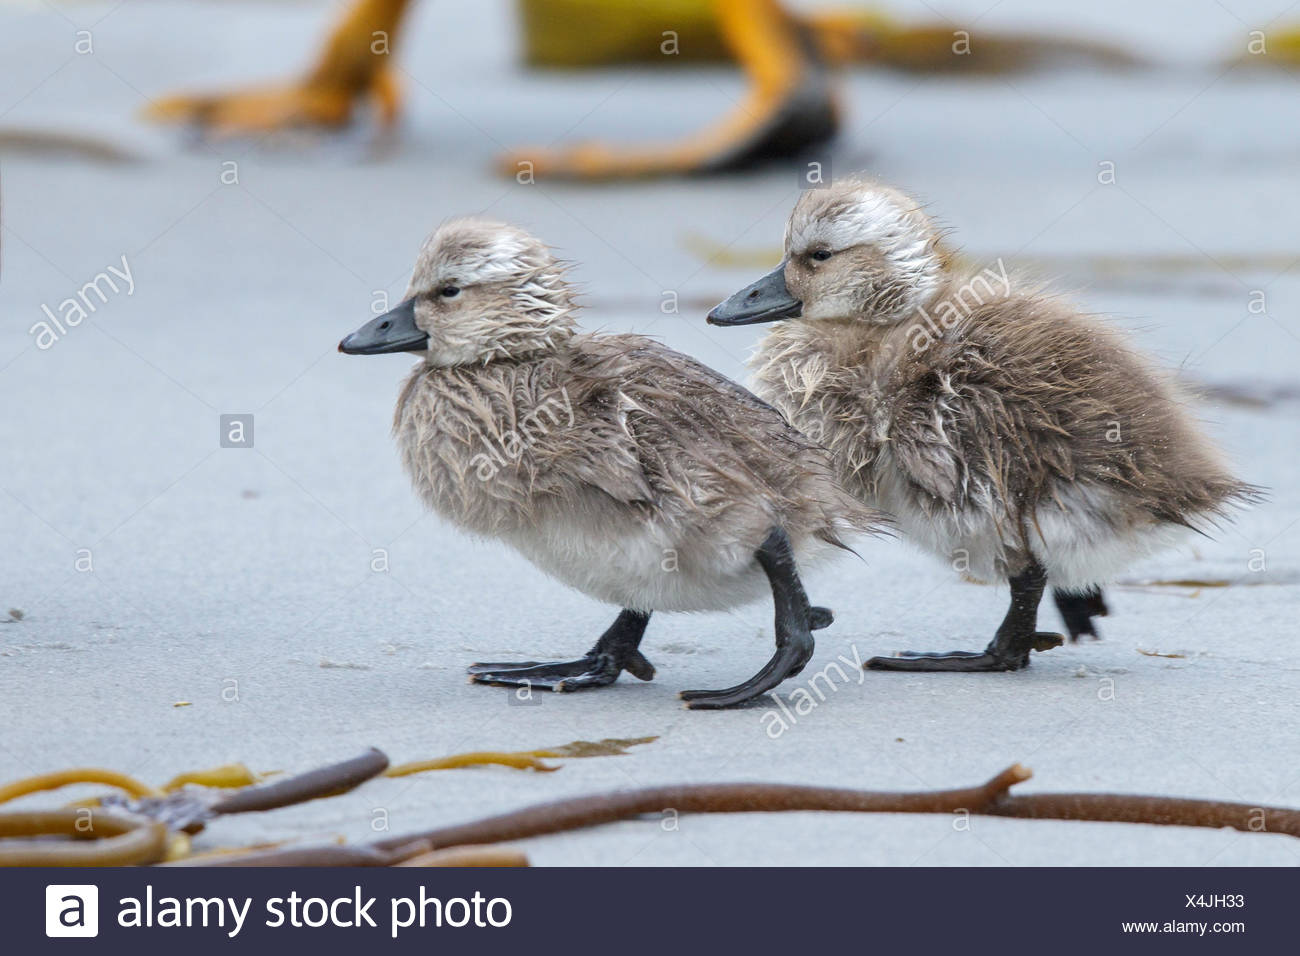 Falkland (Flightless) Steamer-Duck (Tachyeres brachypterus) in the Falkland Islands. - Stock Image